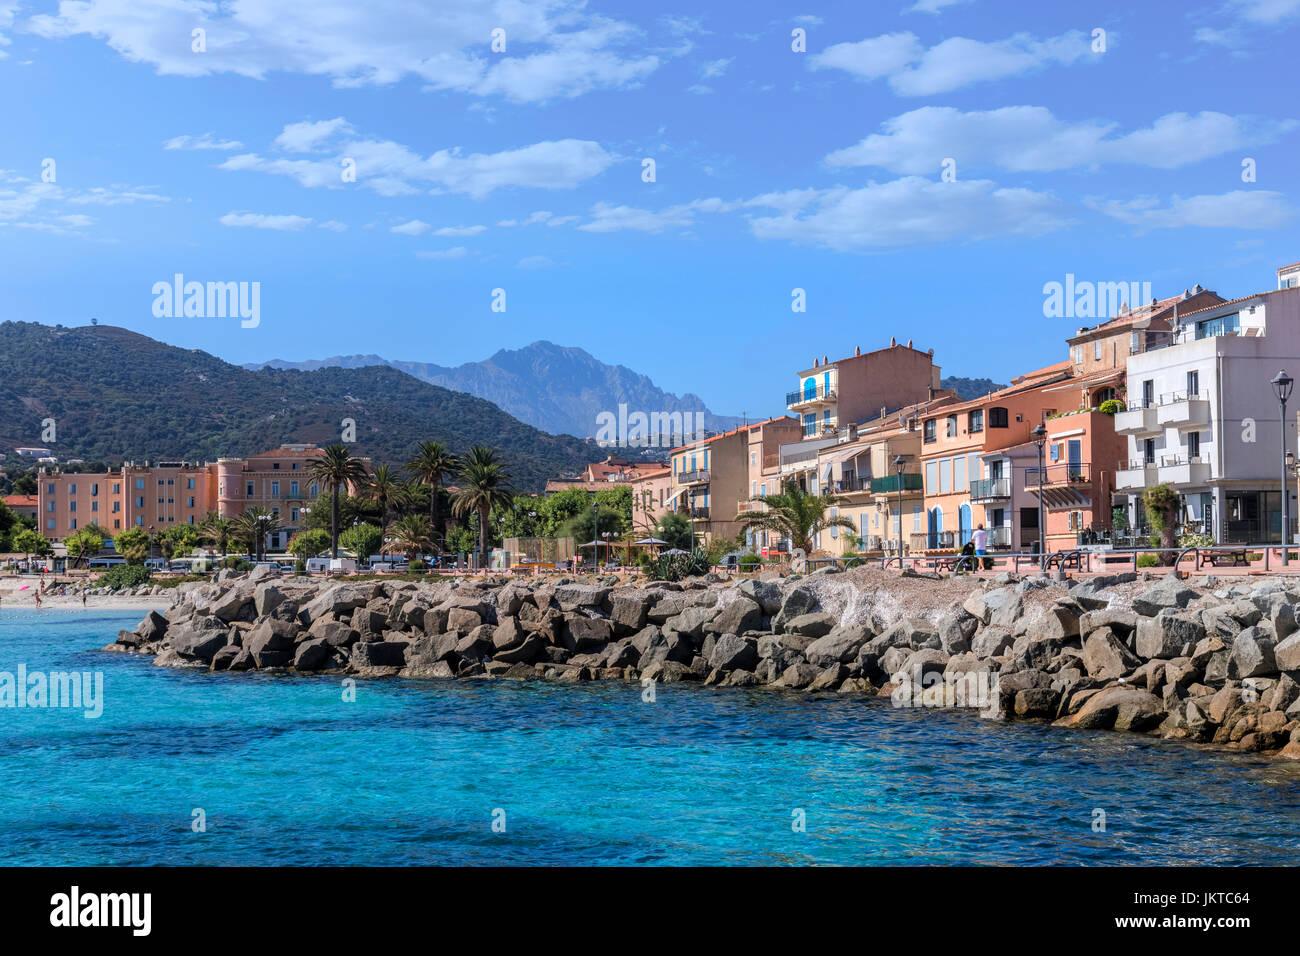 L'ile Rousse, Balagne, Corsica, France Stock Photo